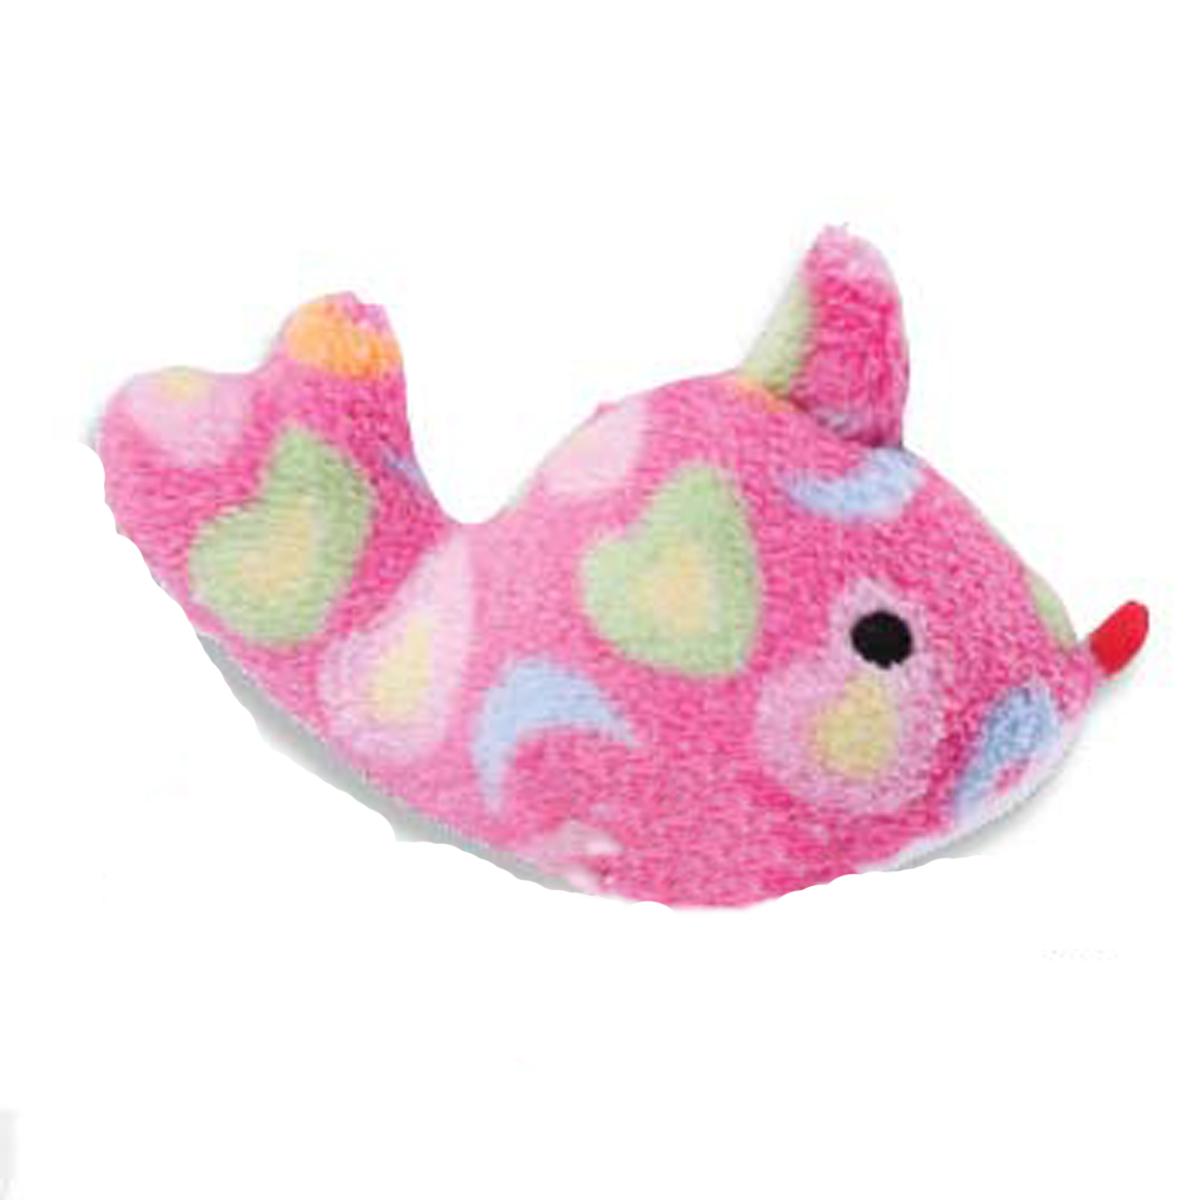 Zanies Sea Charmers Dog Toy - Pink Fish